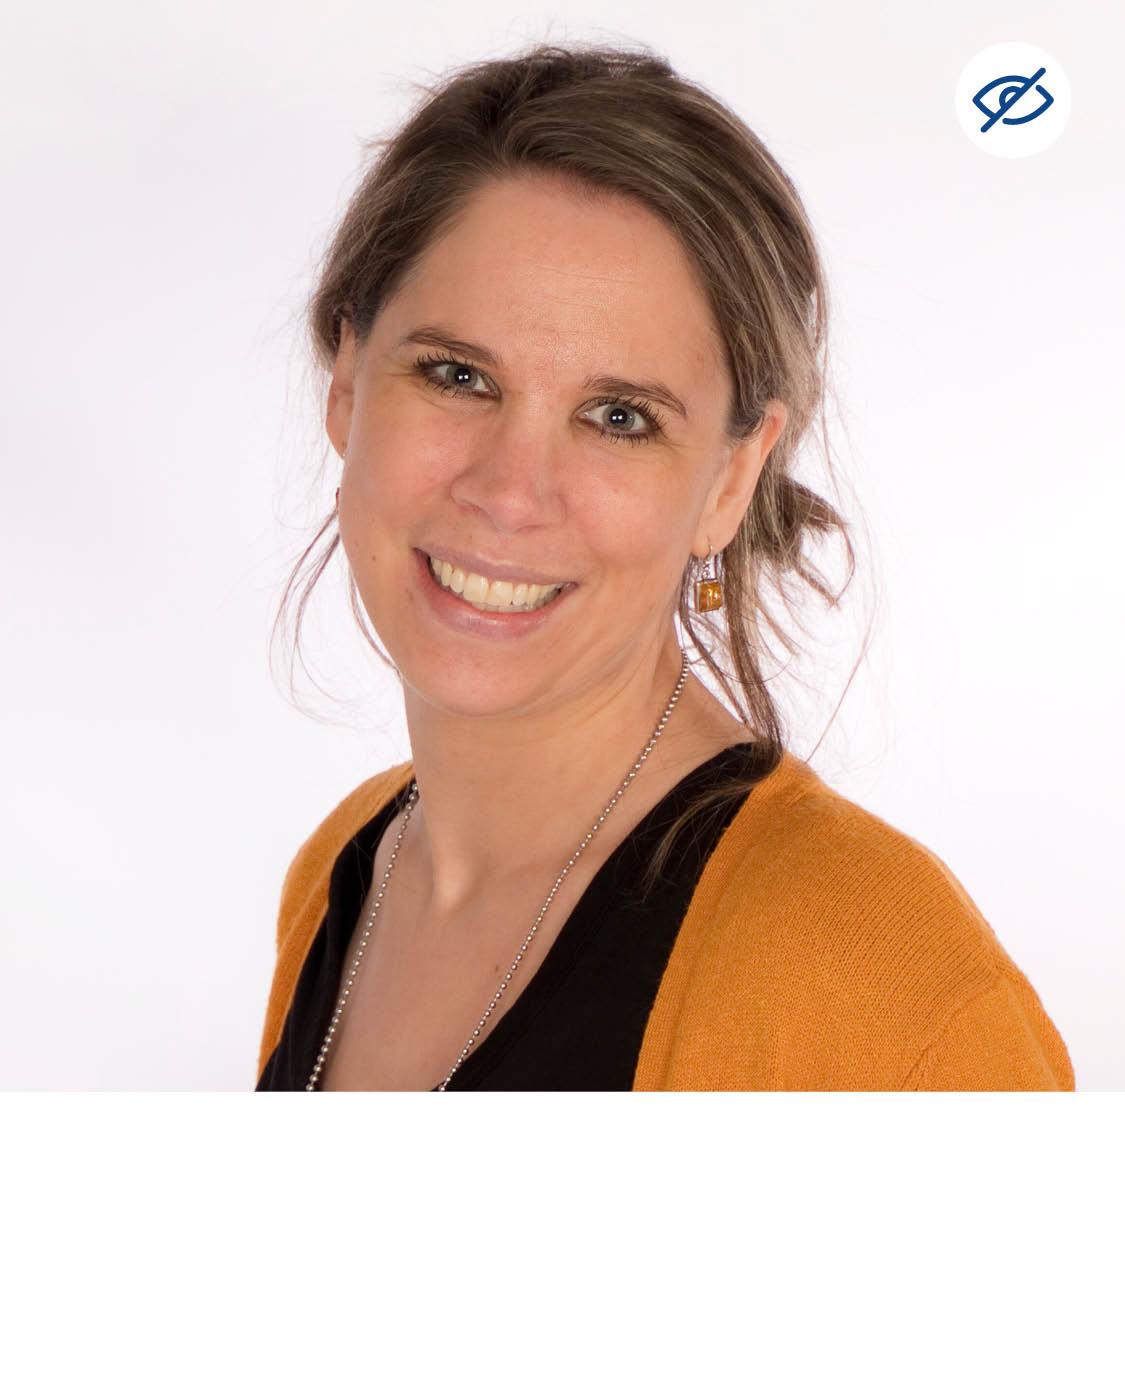 Gabrielle Kuper